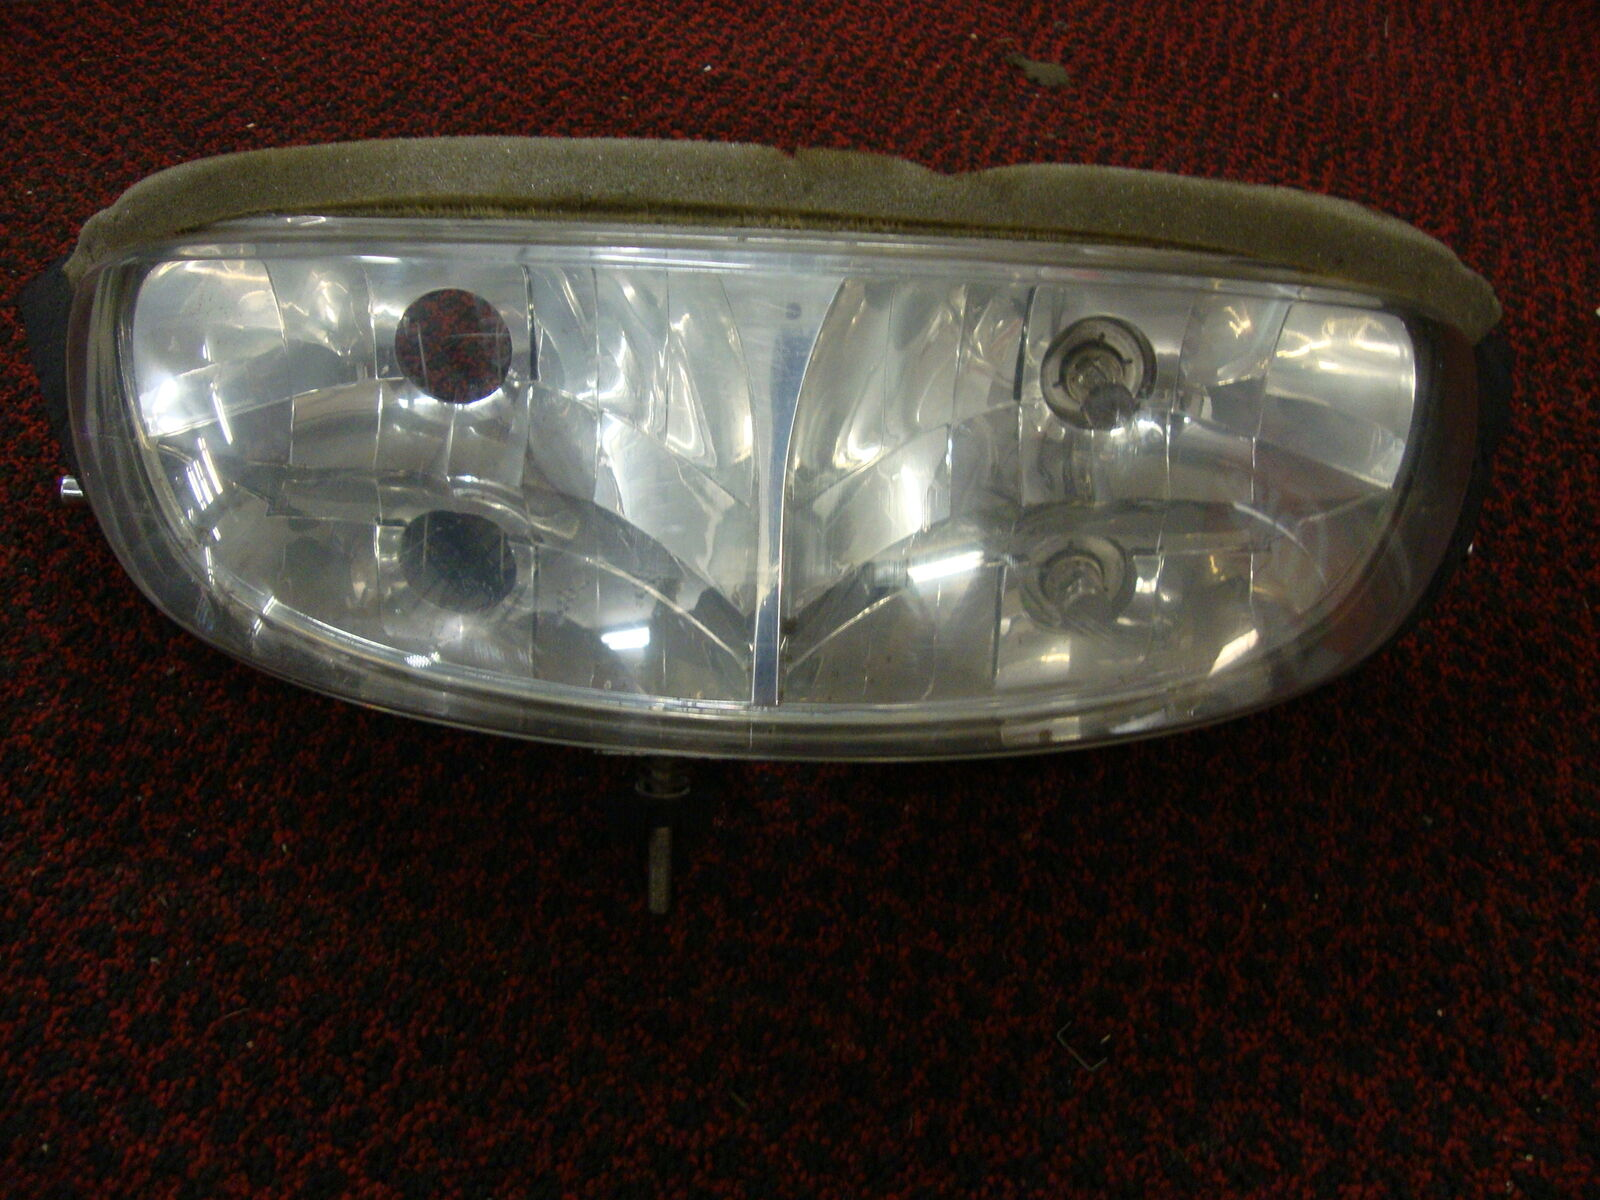 2001 Polaris XC SP 800 FRONT HEAD LIGHT LAMP HEADLIGHT 2410132